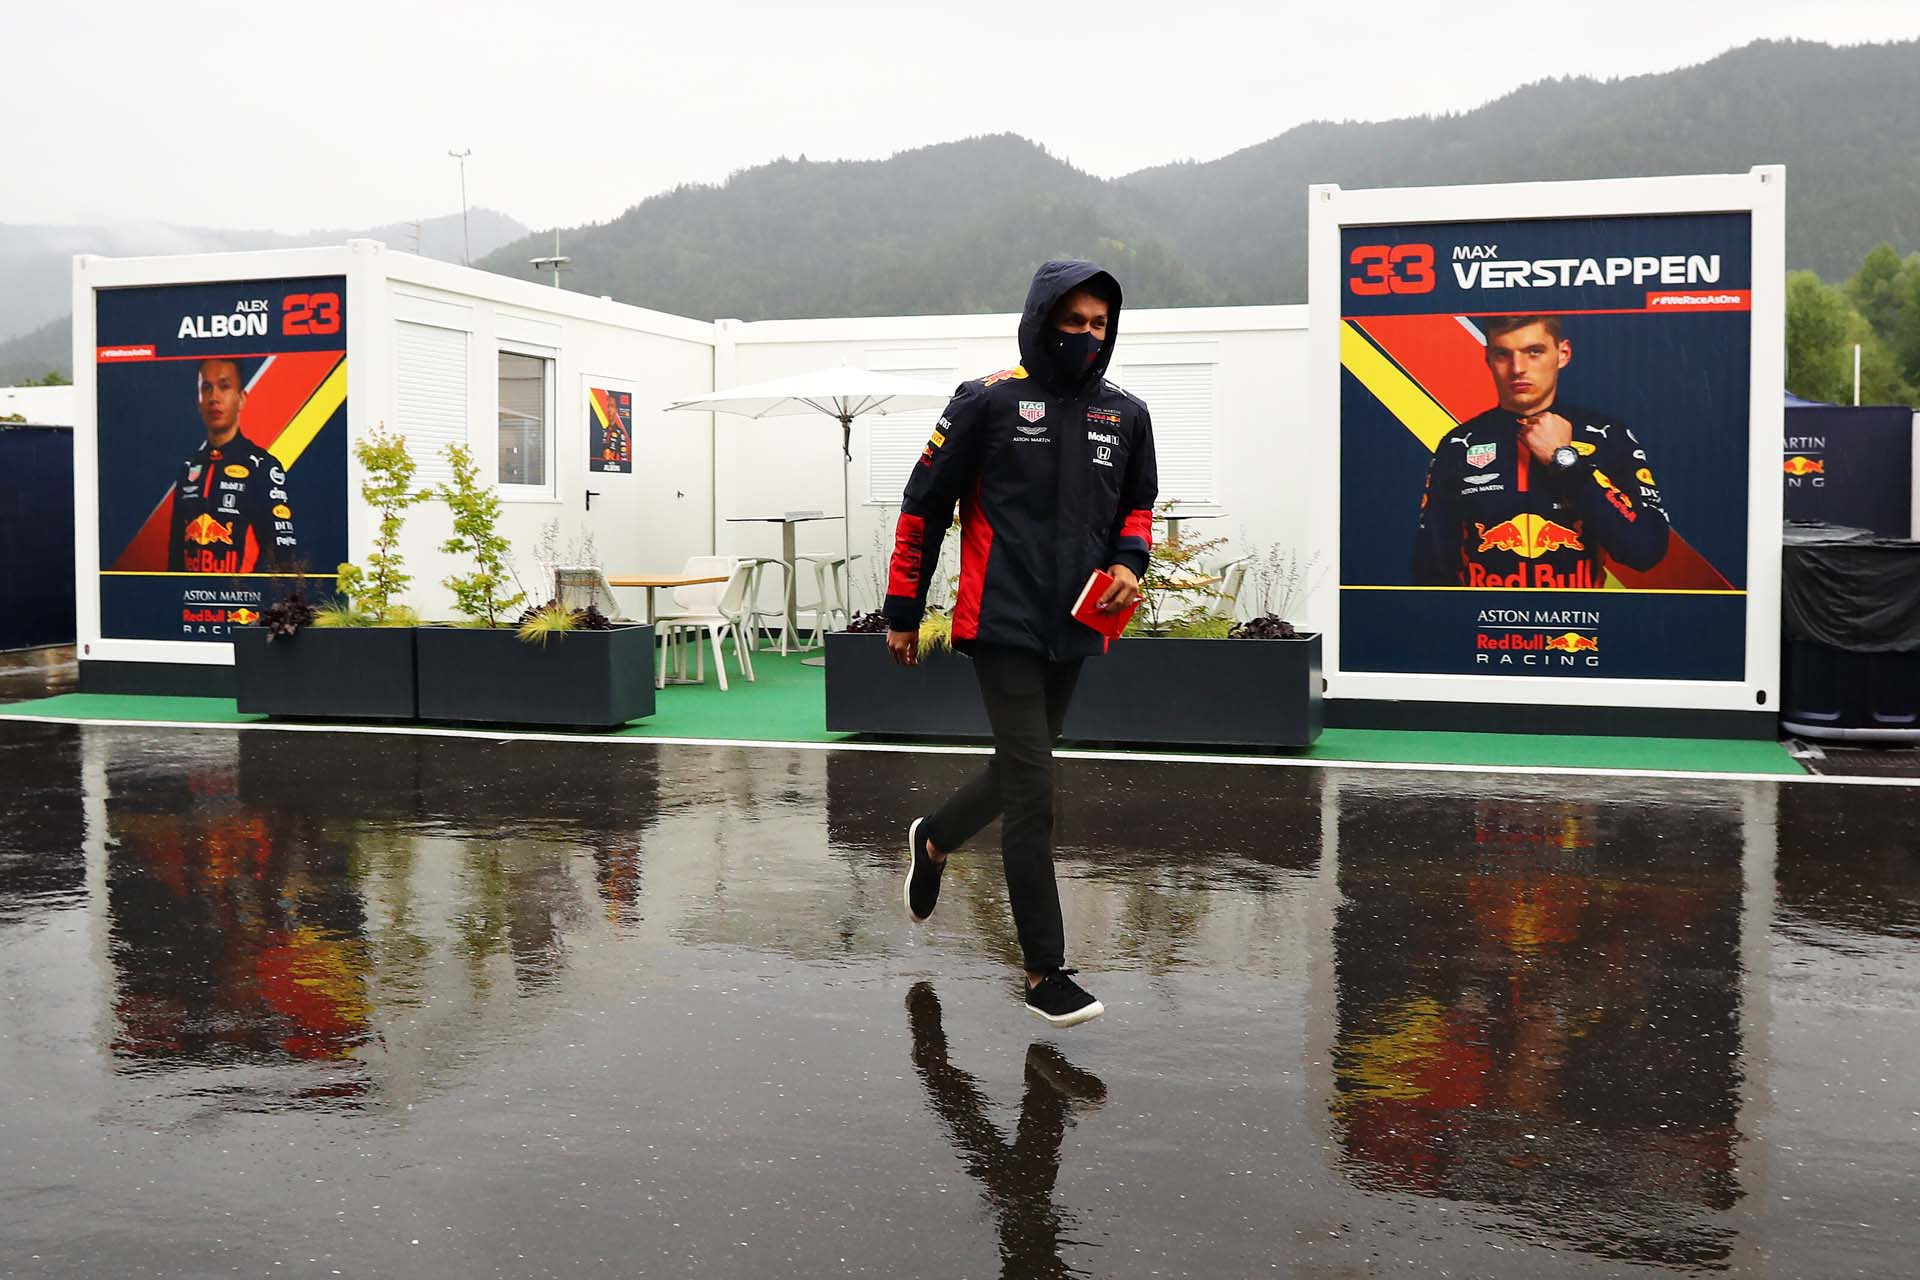 F1 Grand Prix of Styria - Final Practice